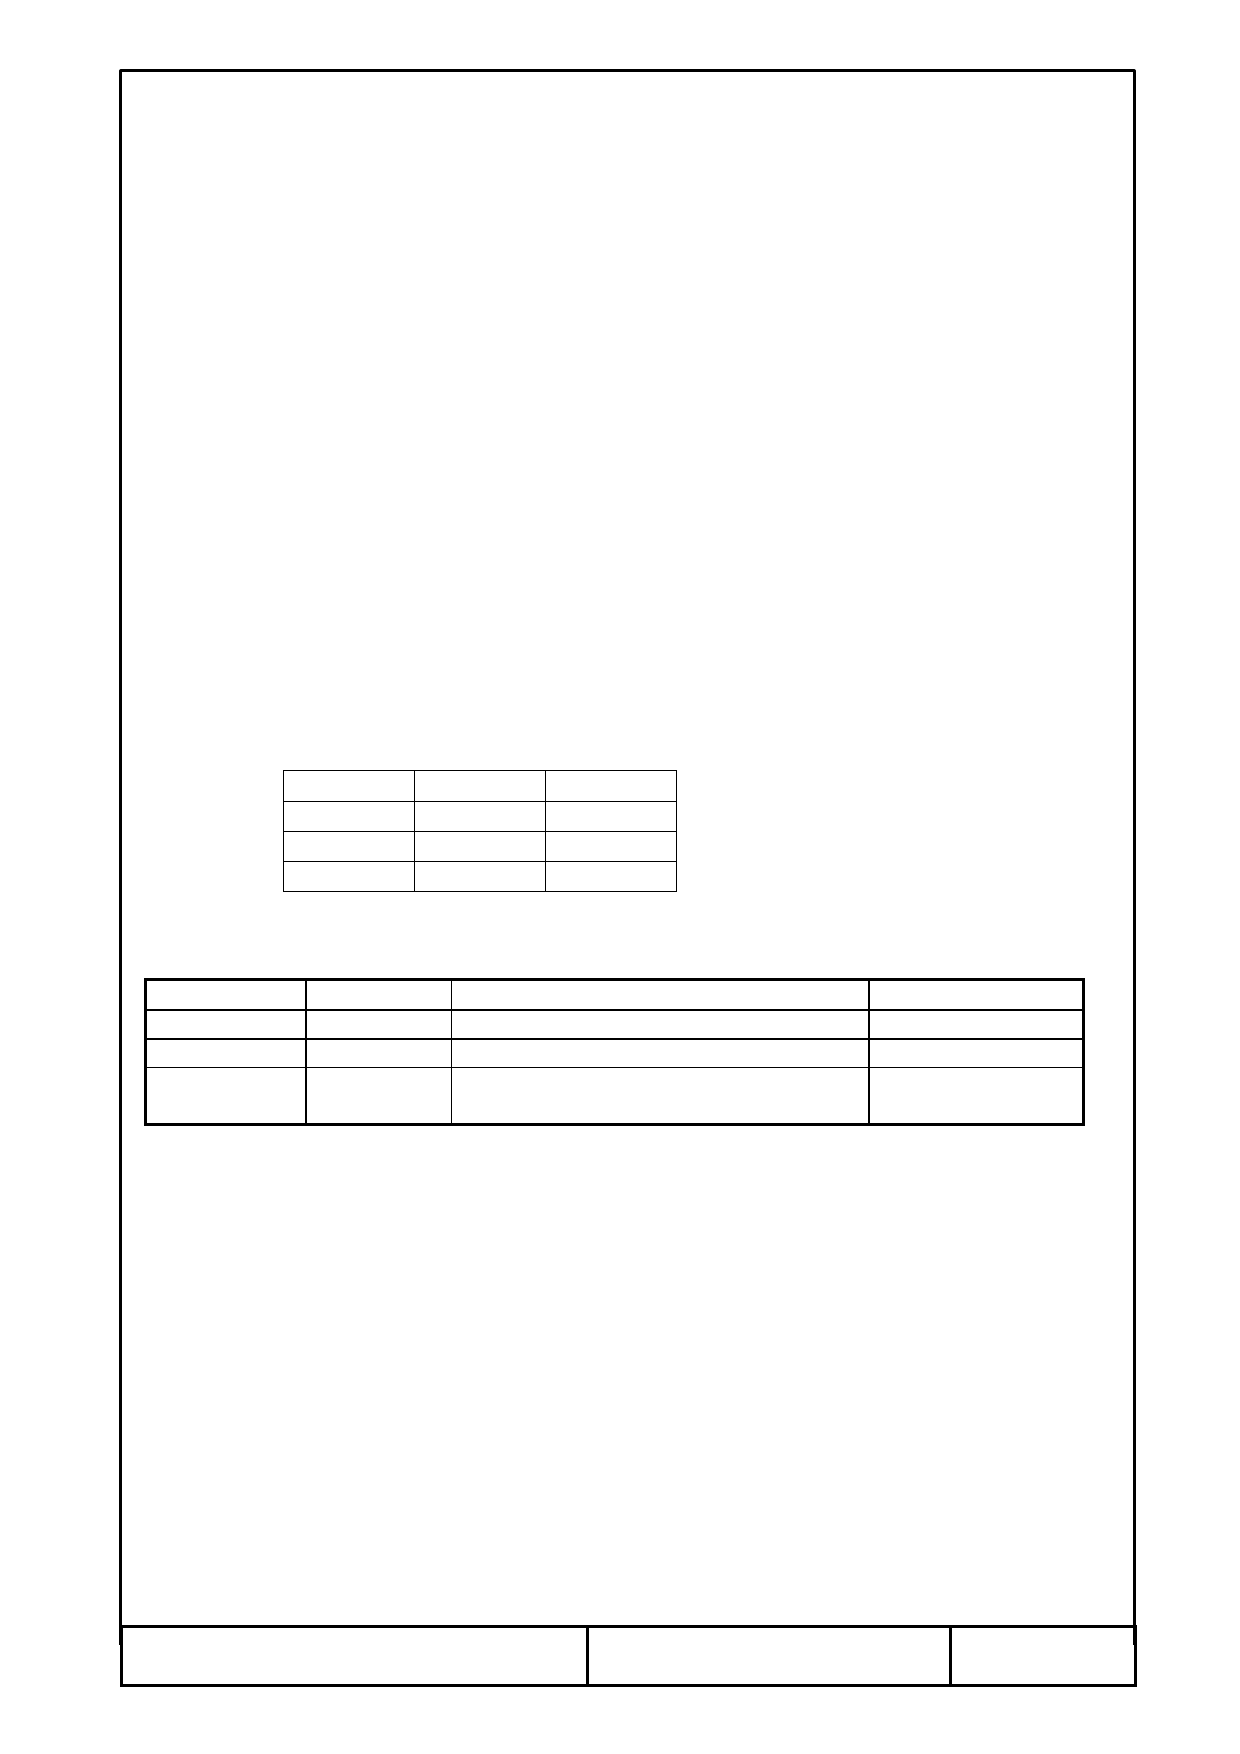 T-51538L079J-FW_P_AA pdf